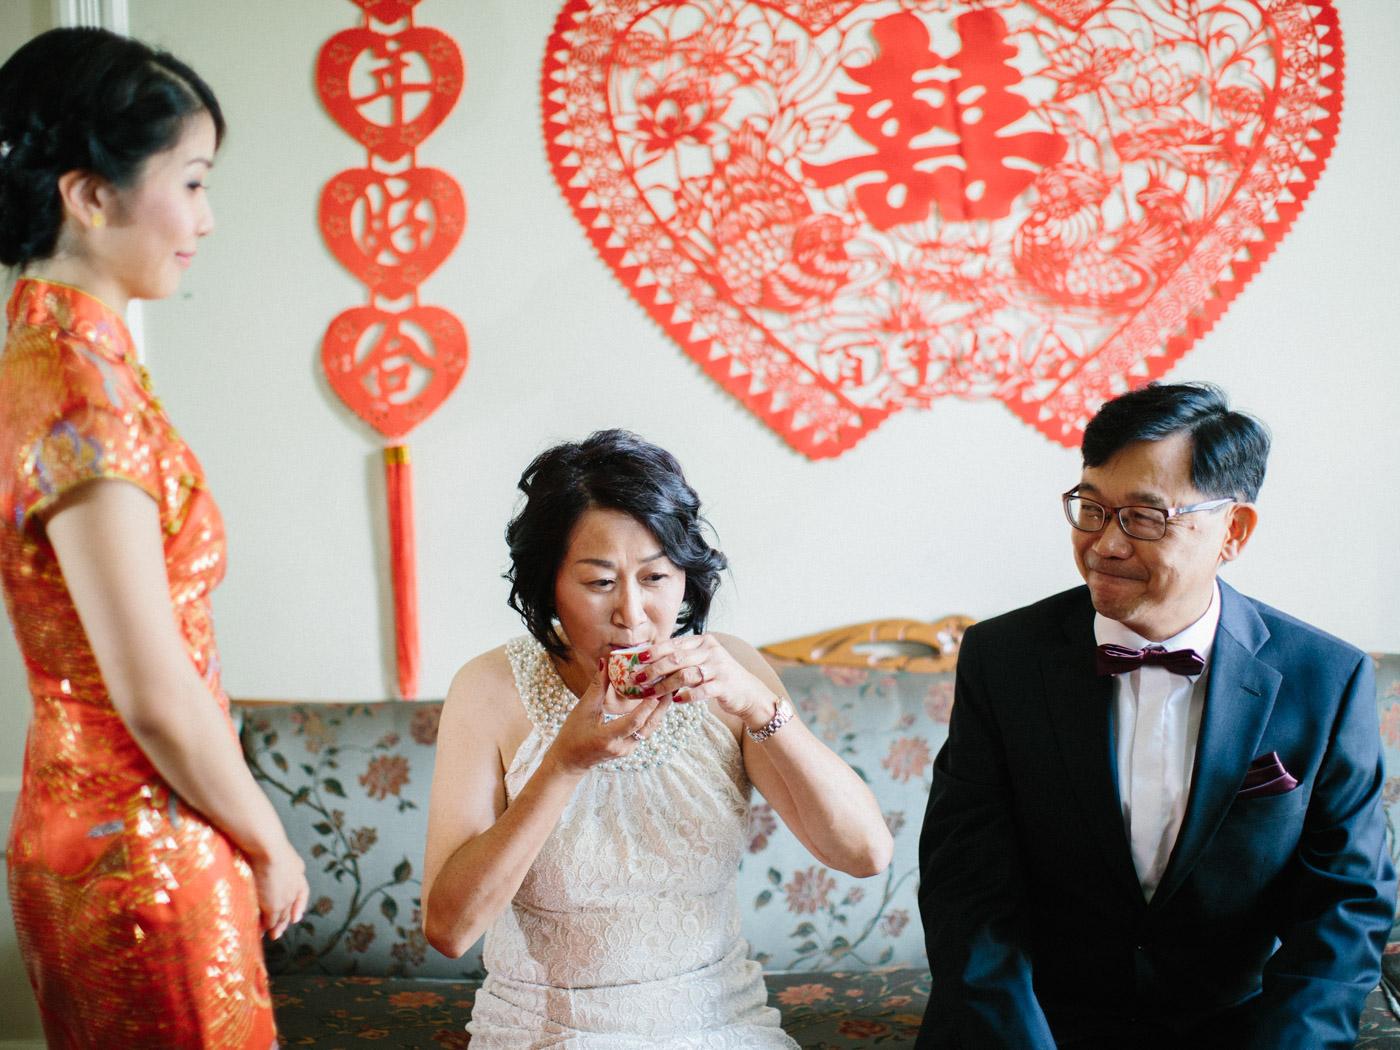 toronto_wedding_photographer_fine_art_documentary_photography-53.jpg